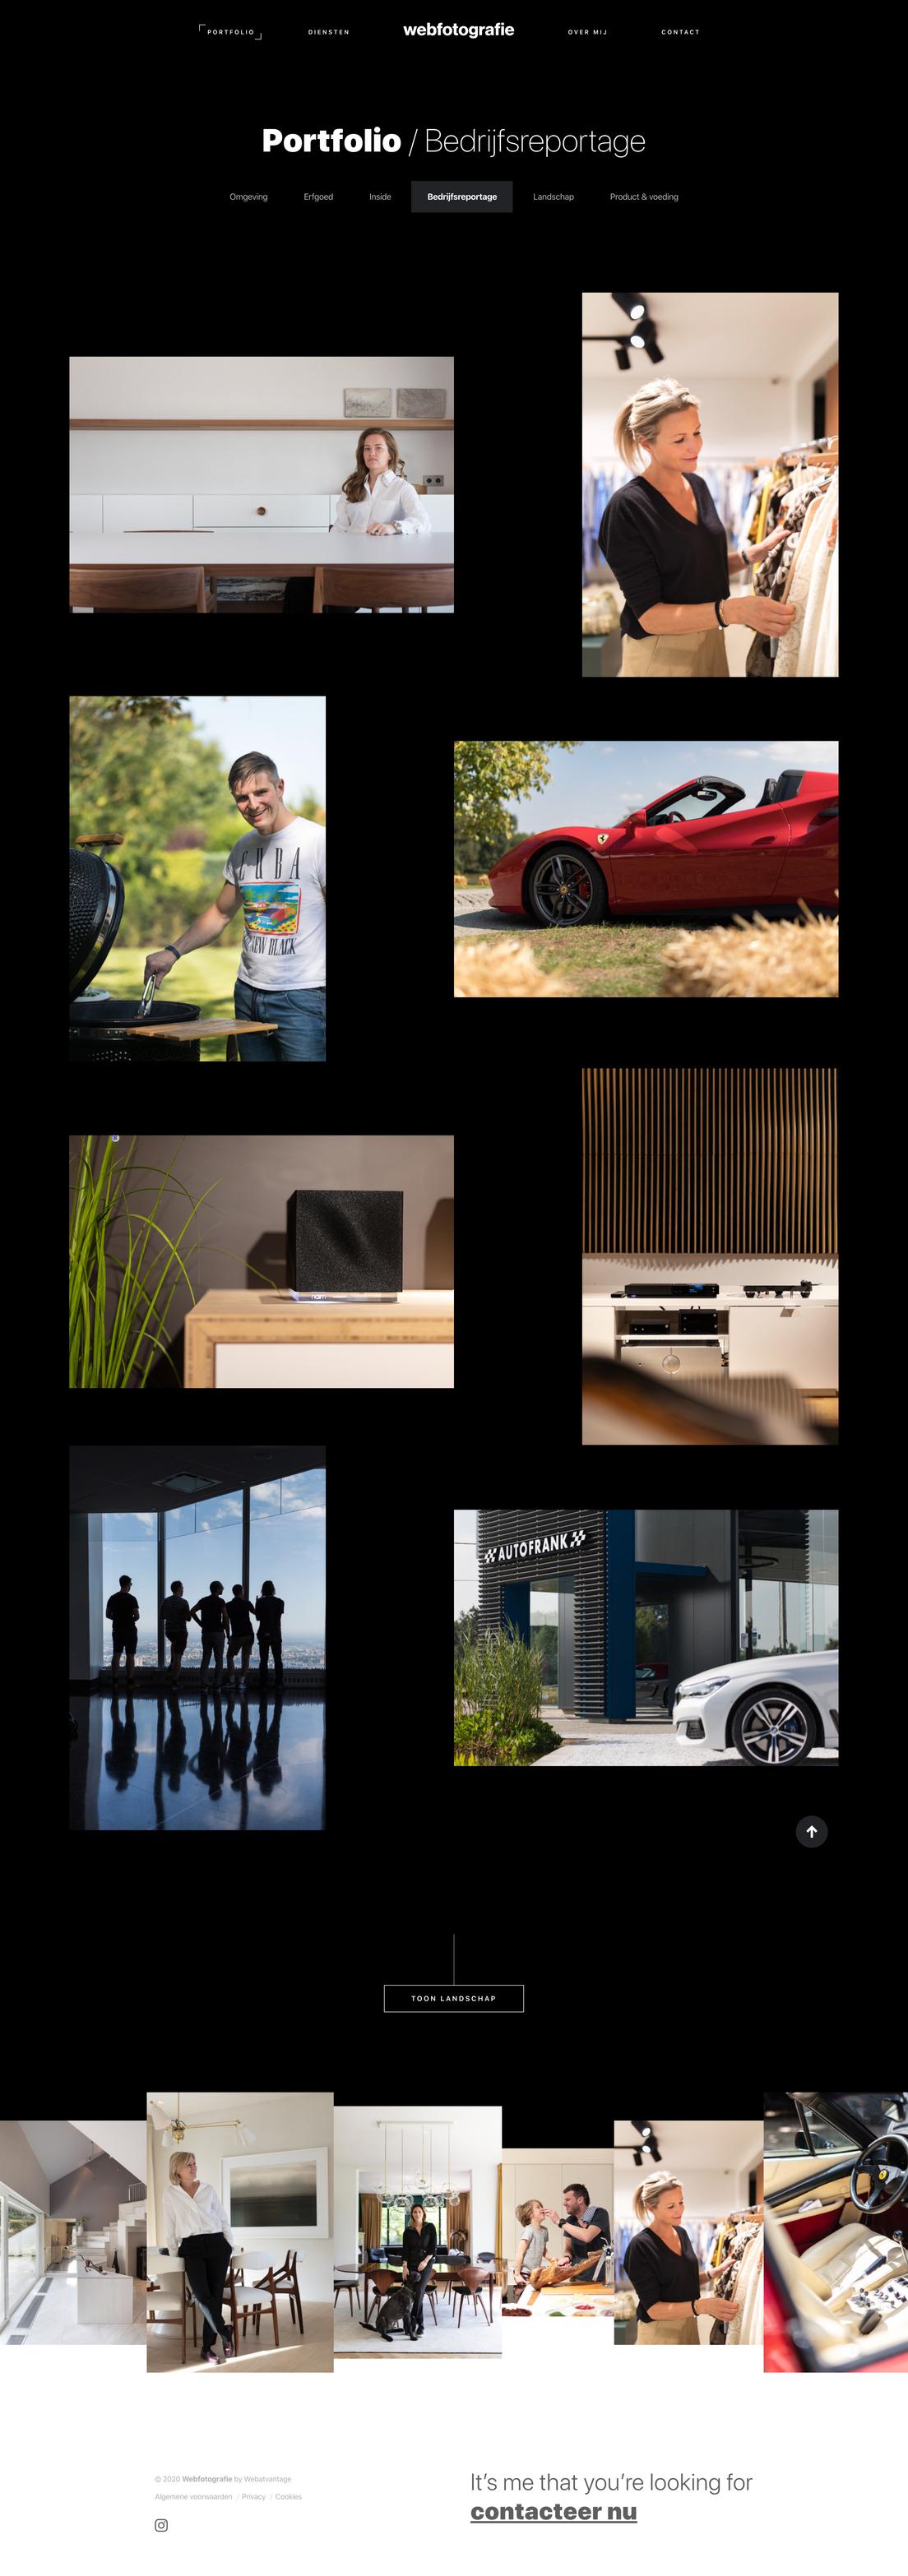 Webfotografie - website - portfolio